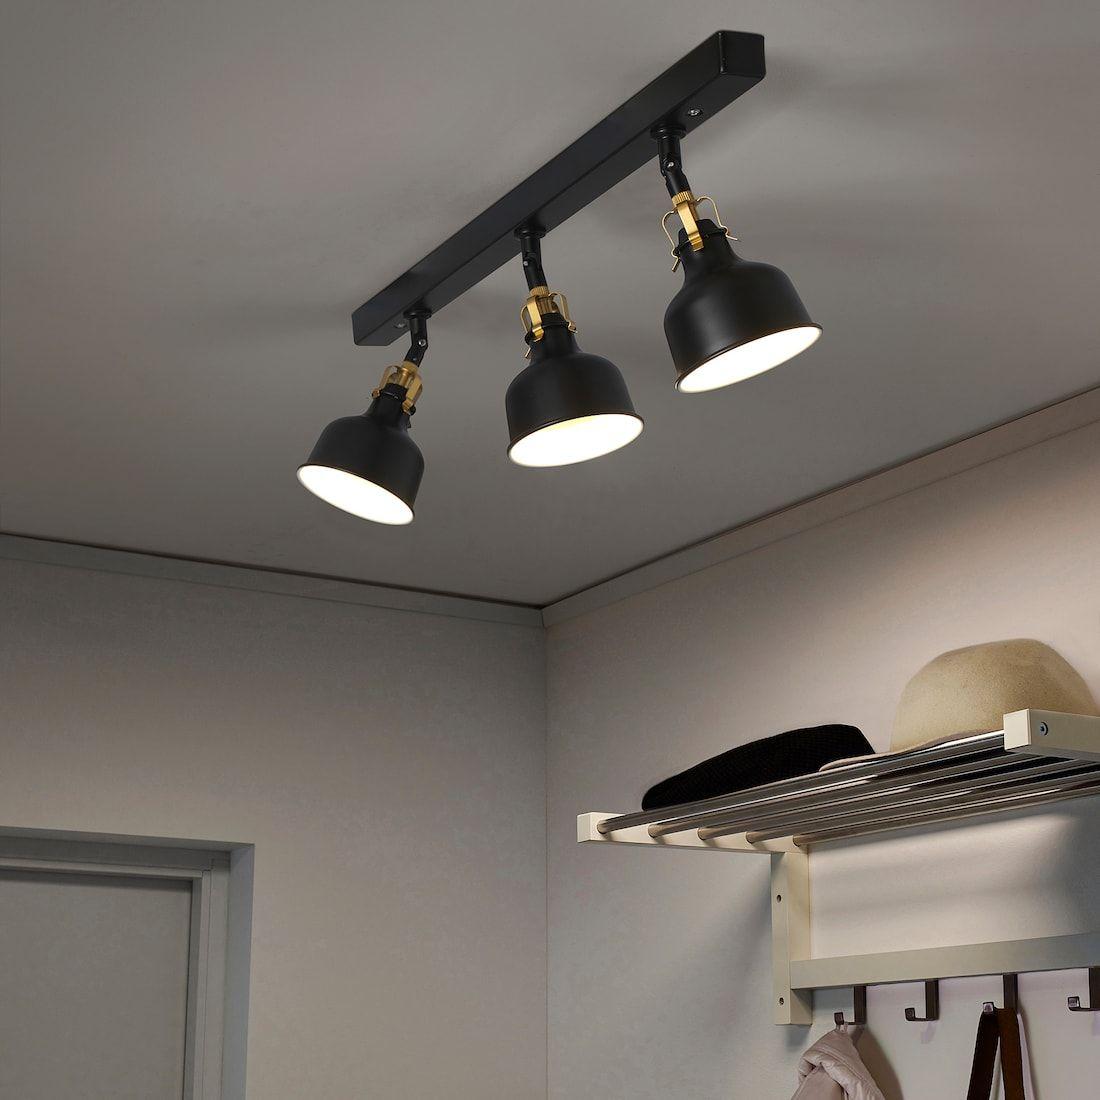 RANARP black, Ceiling track, 3 spots IKEA i 2020